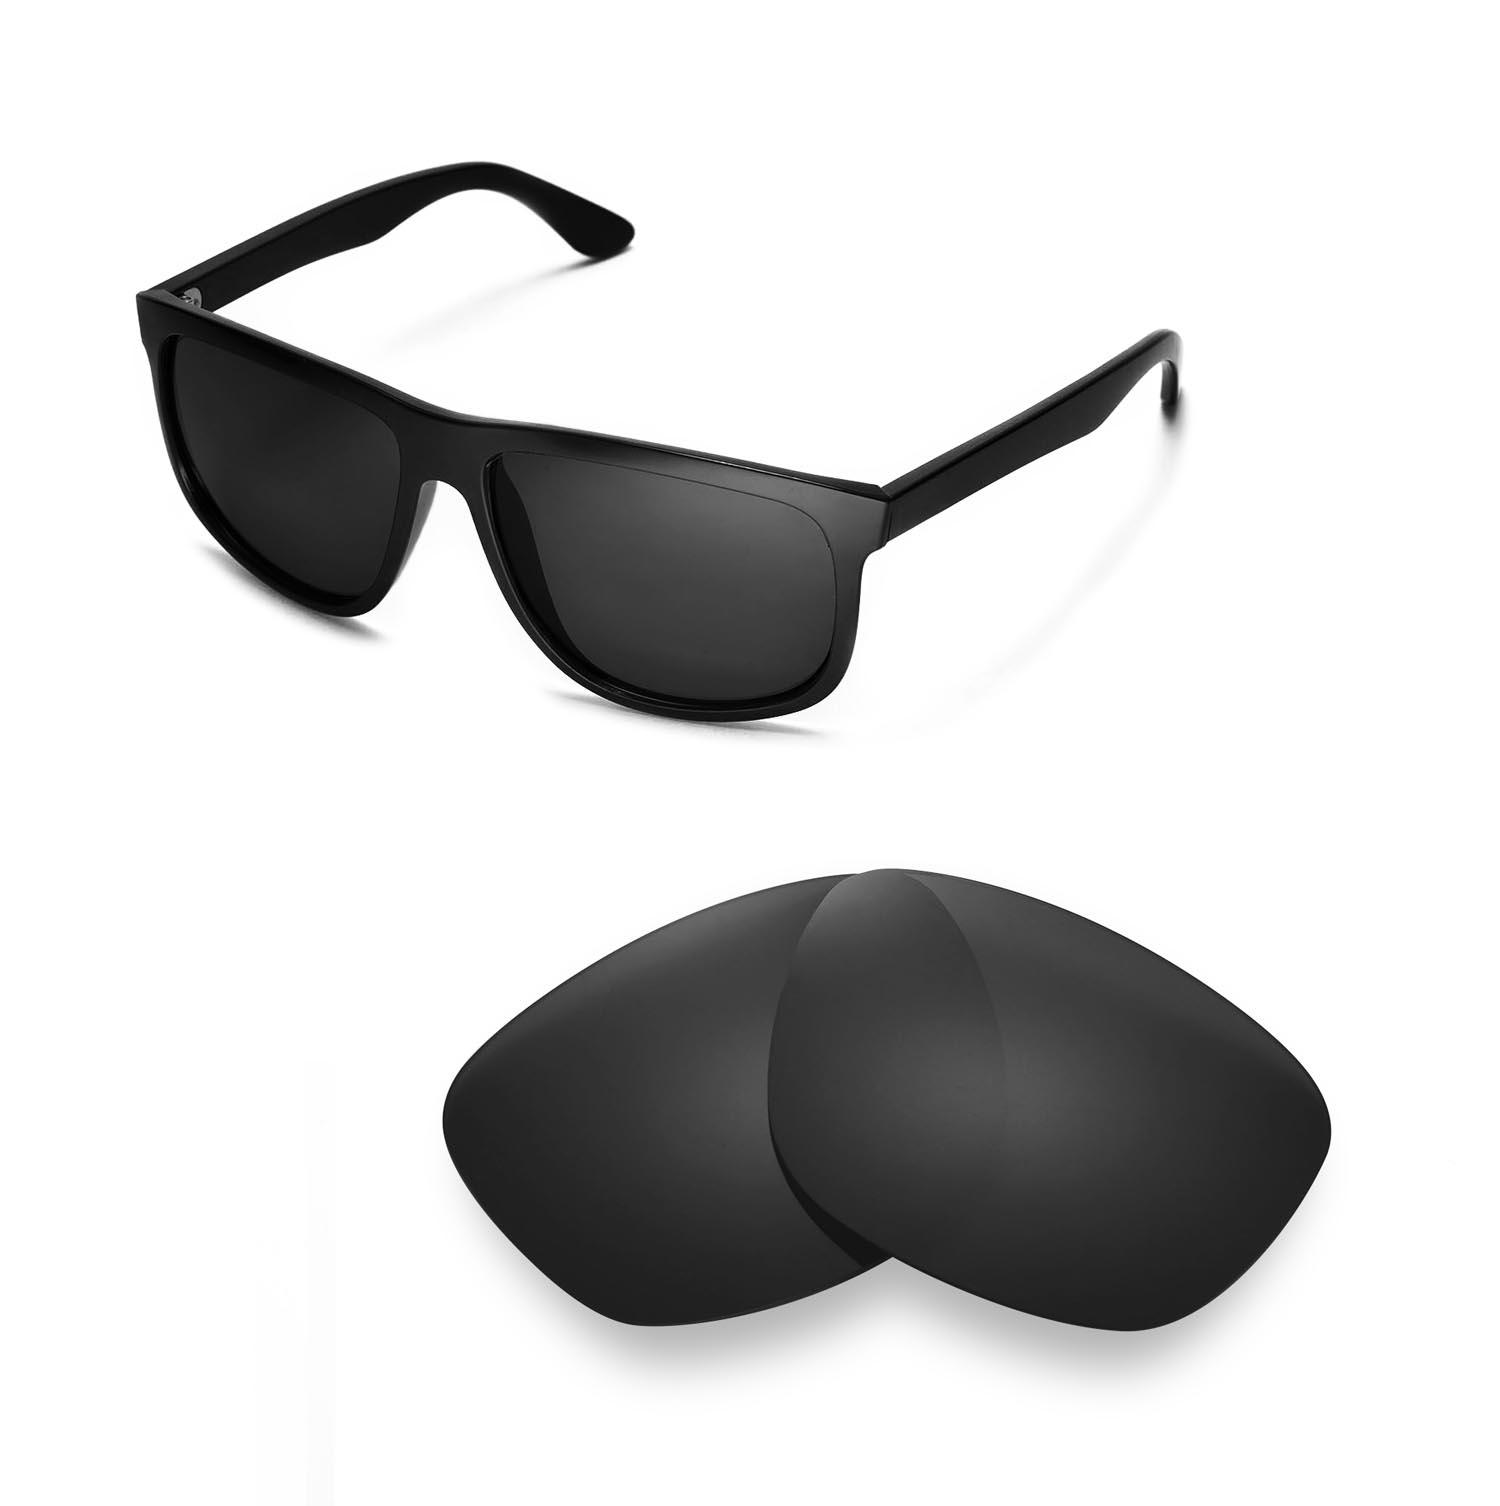 25aa4356034 ... ireland new walleva polarized black lenses for ray ban rb4147 60mm  0f5d8 54d9b